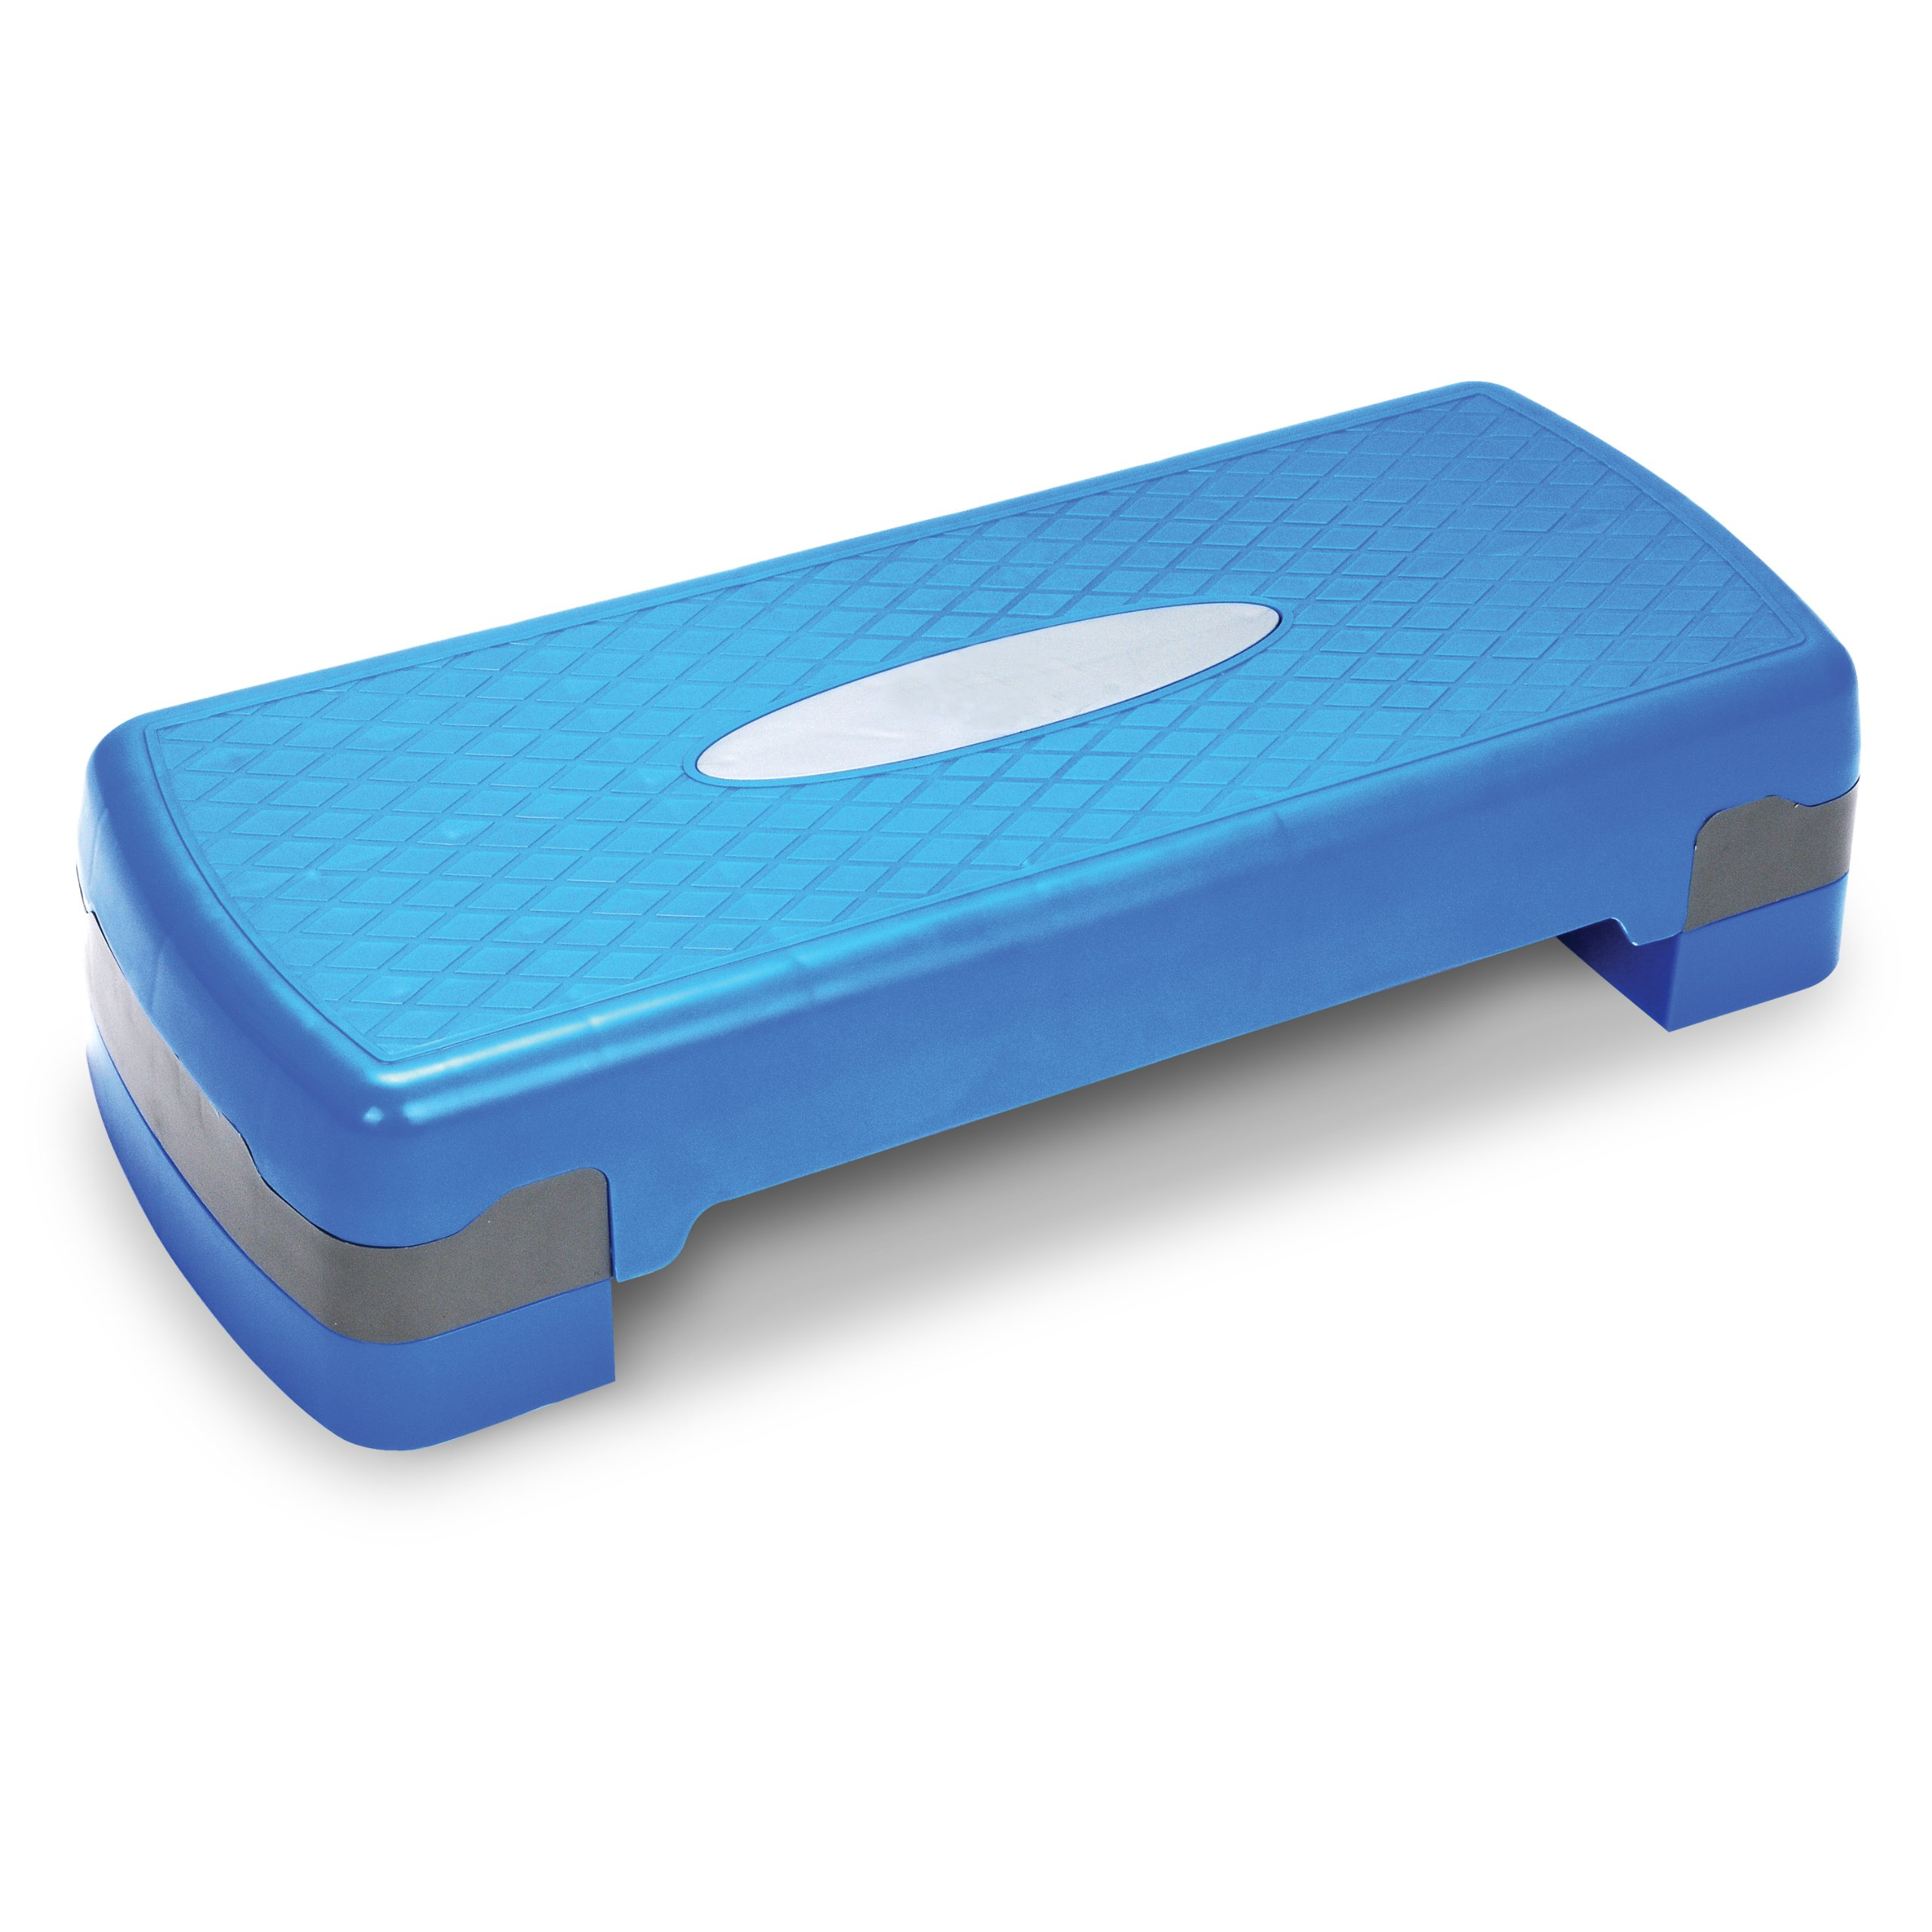 Tone Fitness Aerobic Exercise Platform